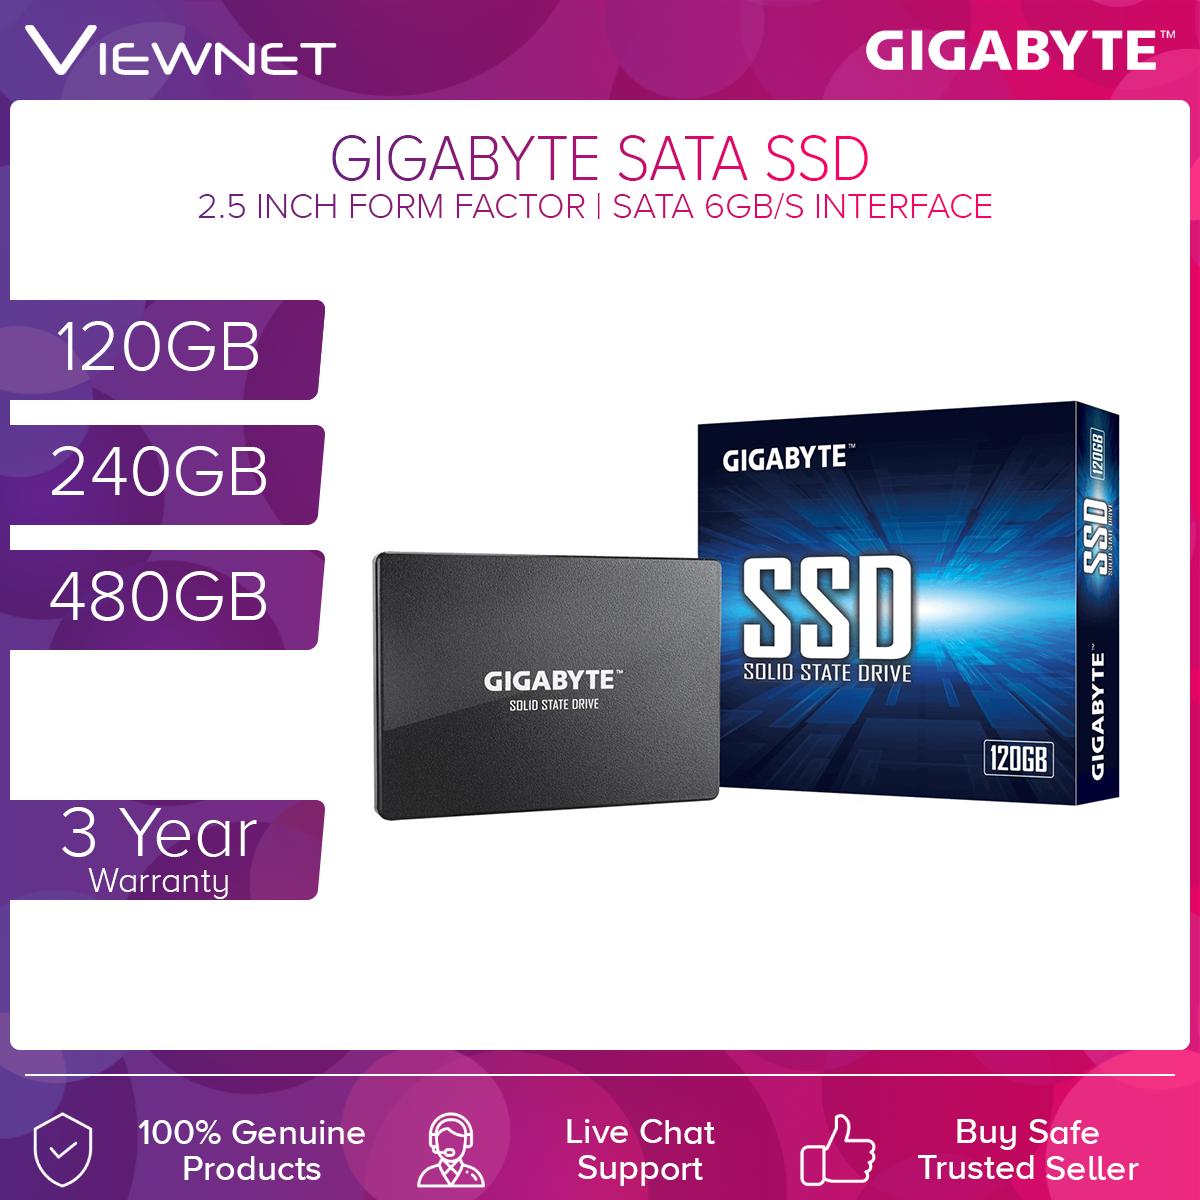 Gigabyte SATA 120GB/240GB/480GB SSD Solid State Drives (GP-GSTFS31120GNTD/GP-GSTFS31240GNTD/GP-GSTFS31256GNTD/GP-GSTFS31480GNTD)